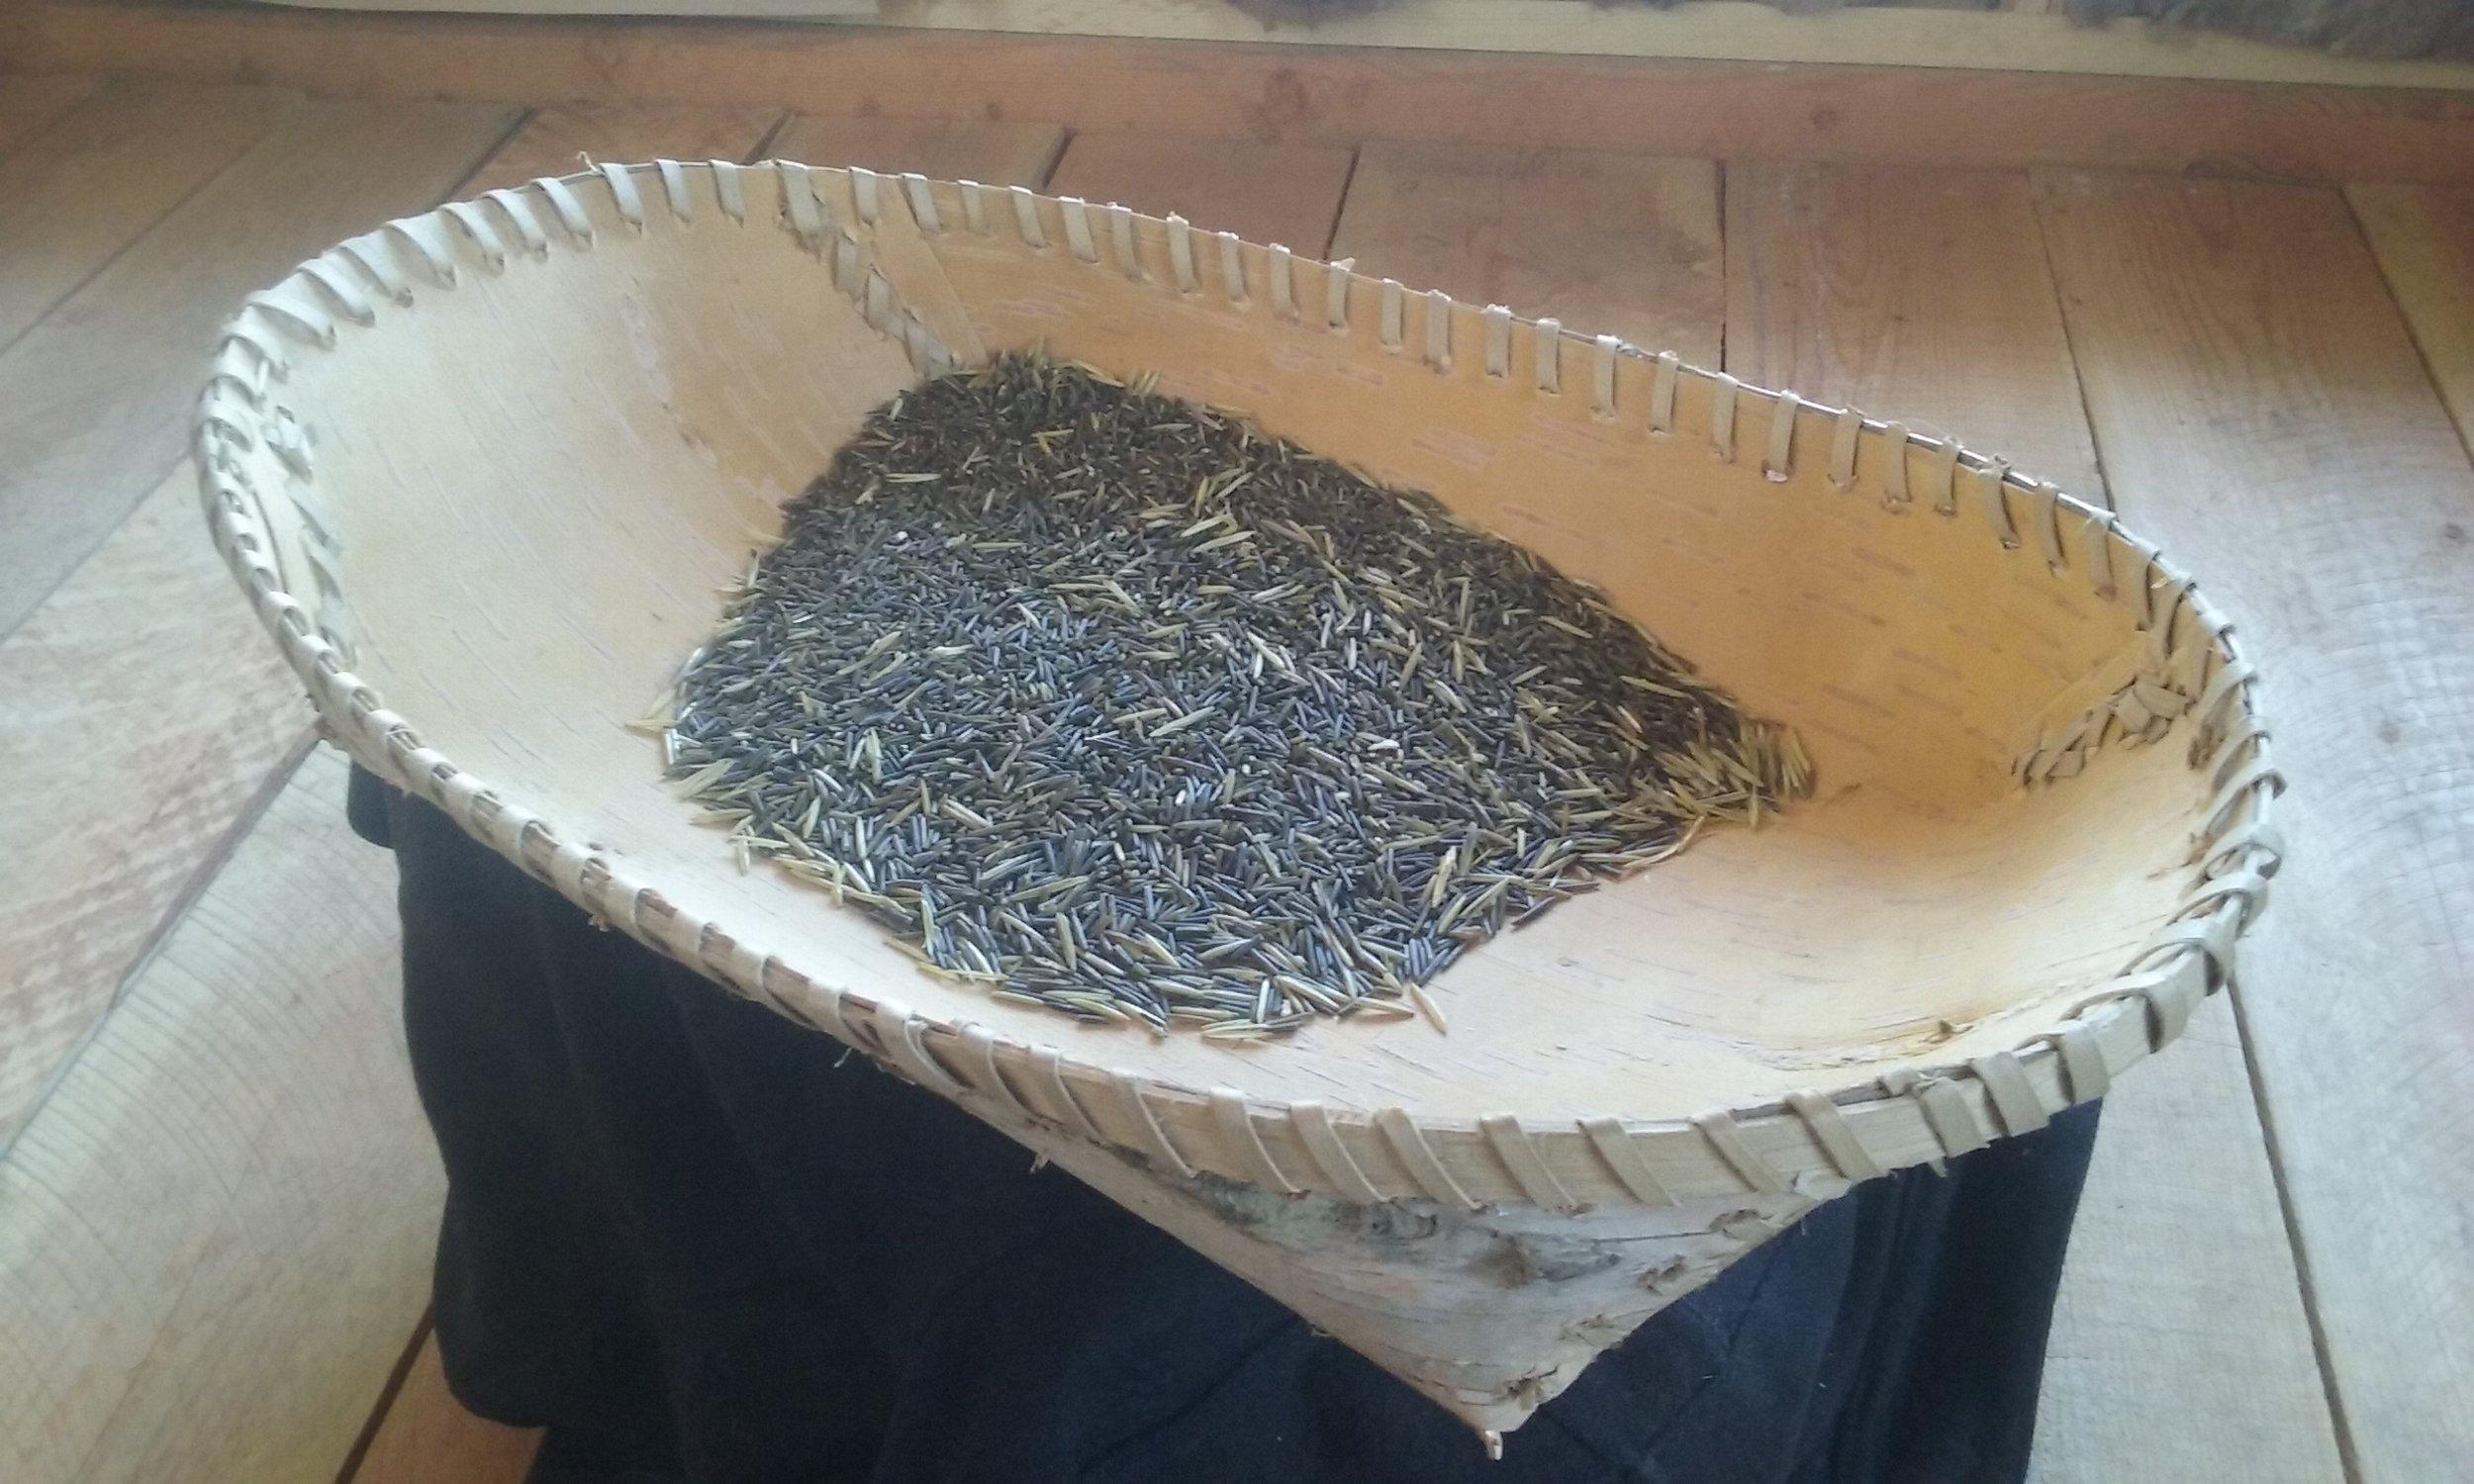 Processed Wild Rice, Mmyum!